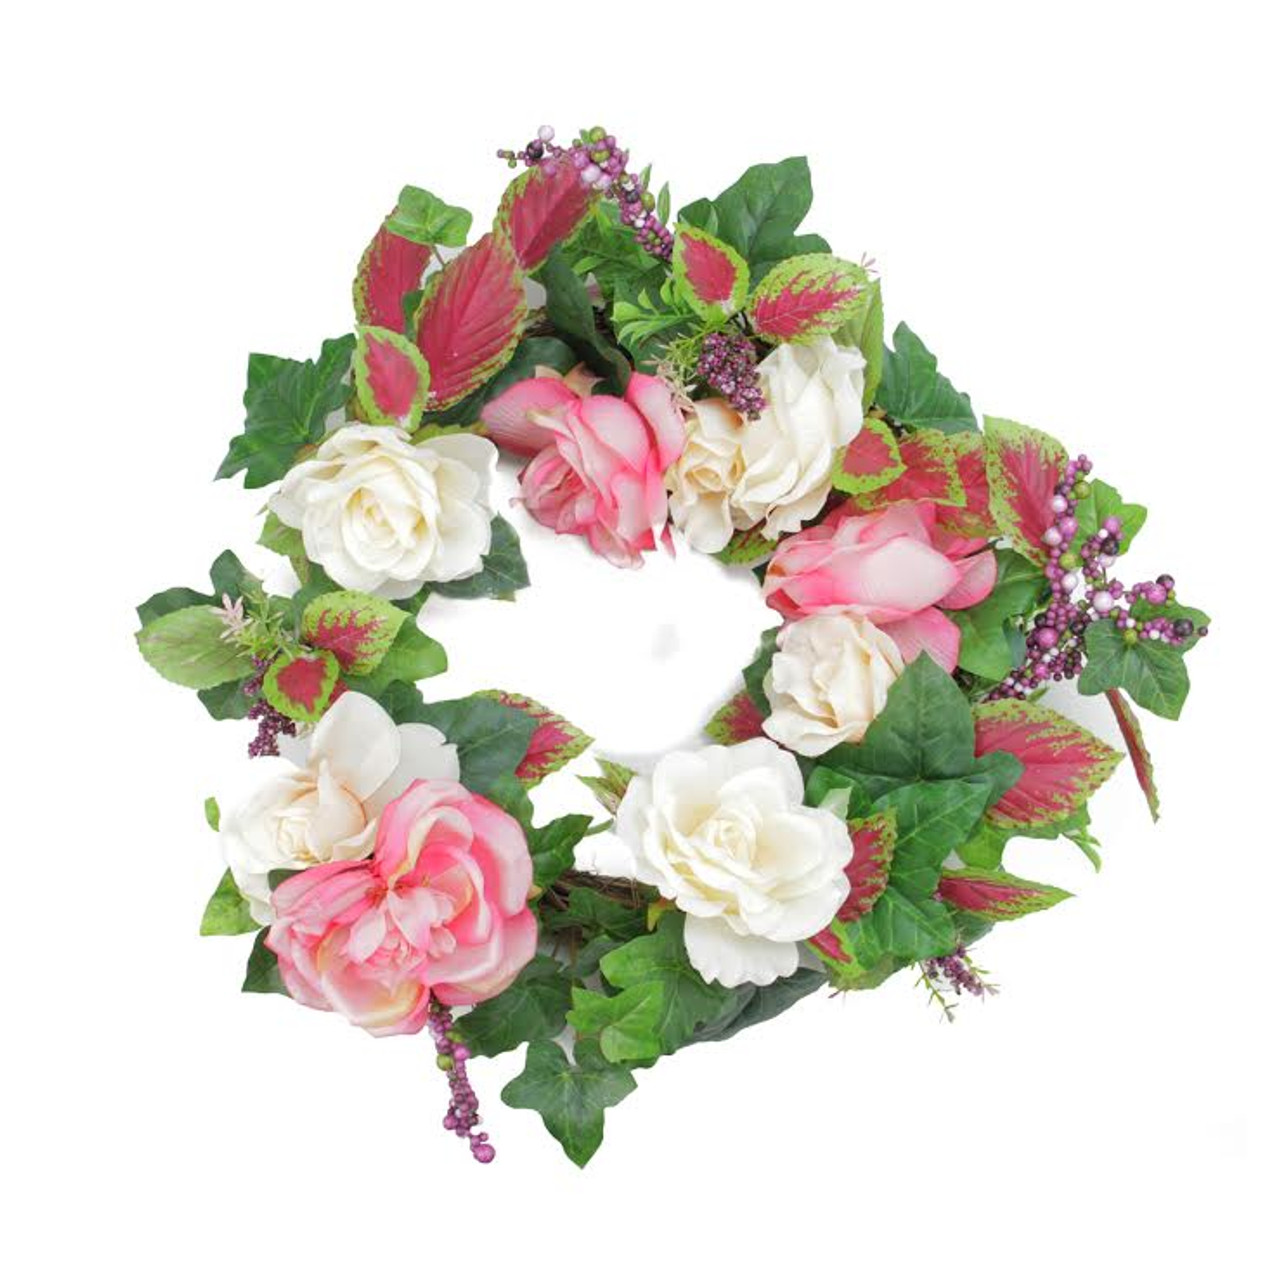 225 Decorative Cream Pink Rose Flowers Berries Artificial